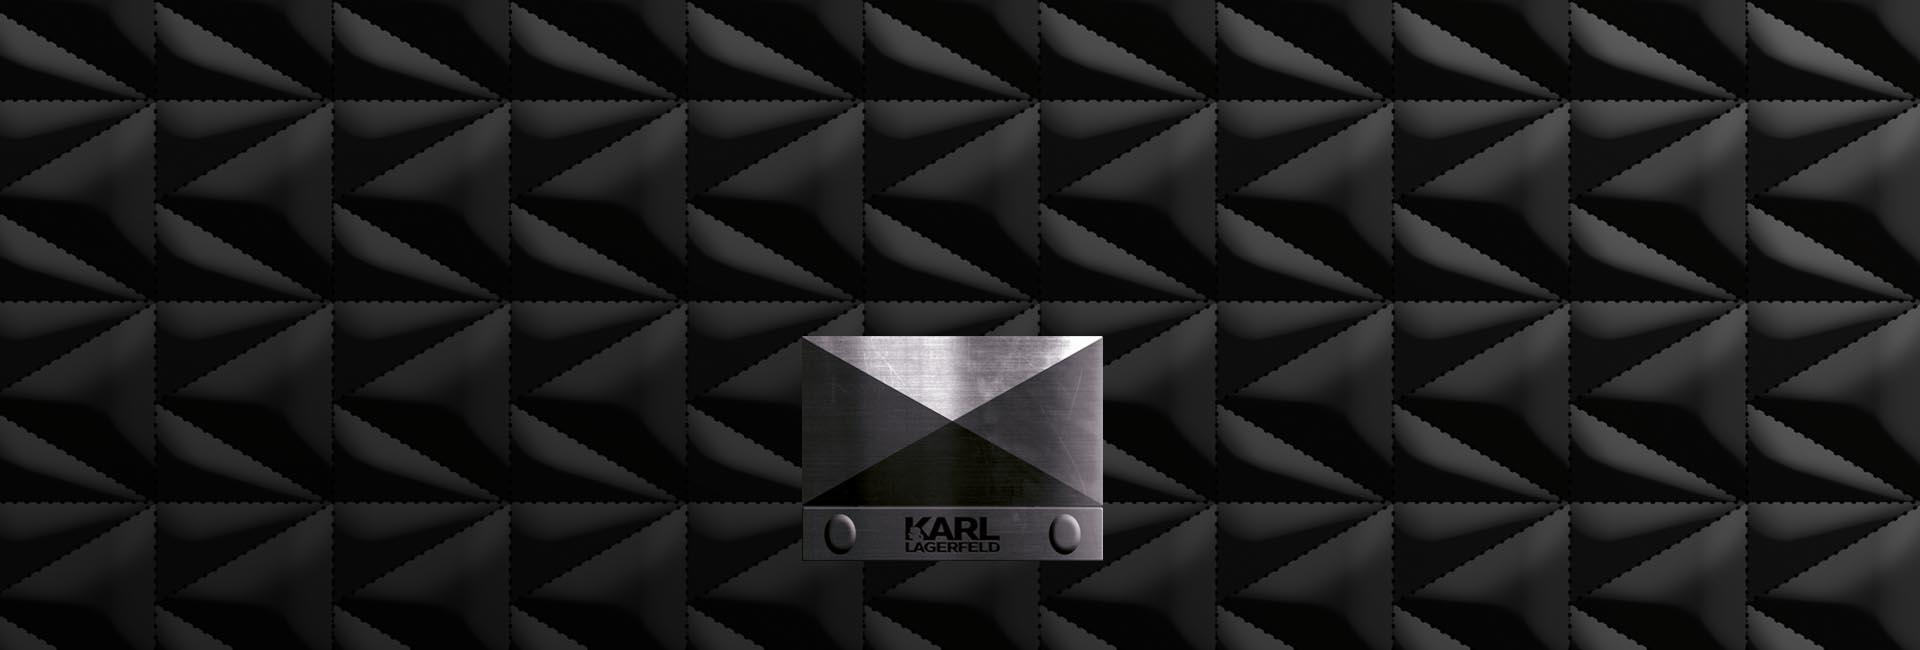 Karl Largerfeld